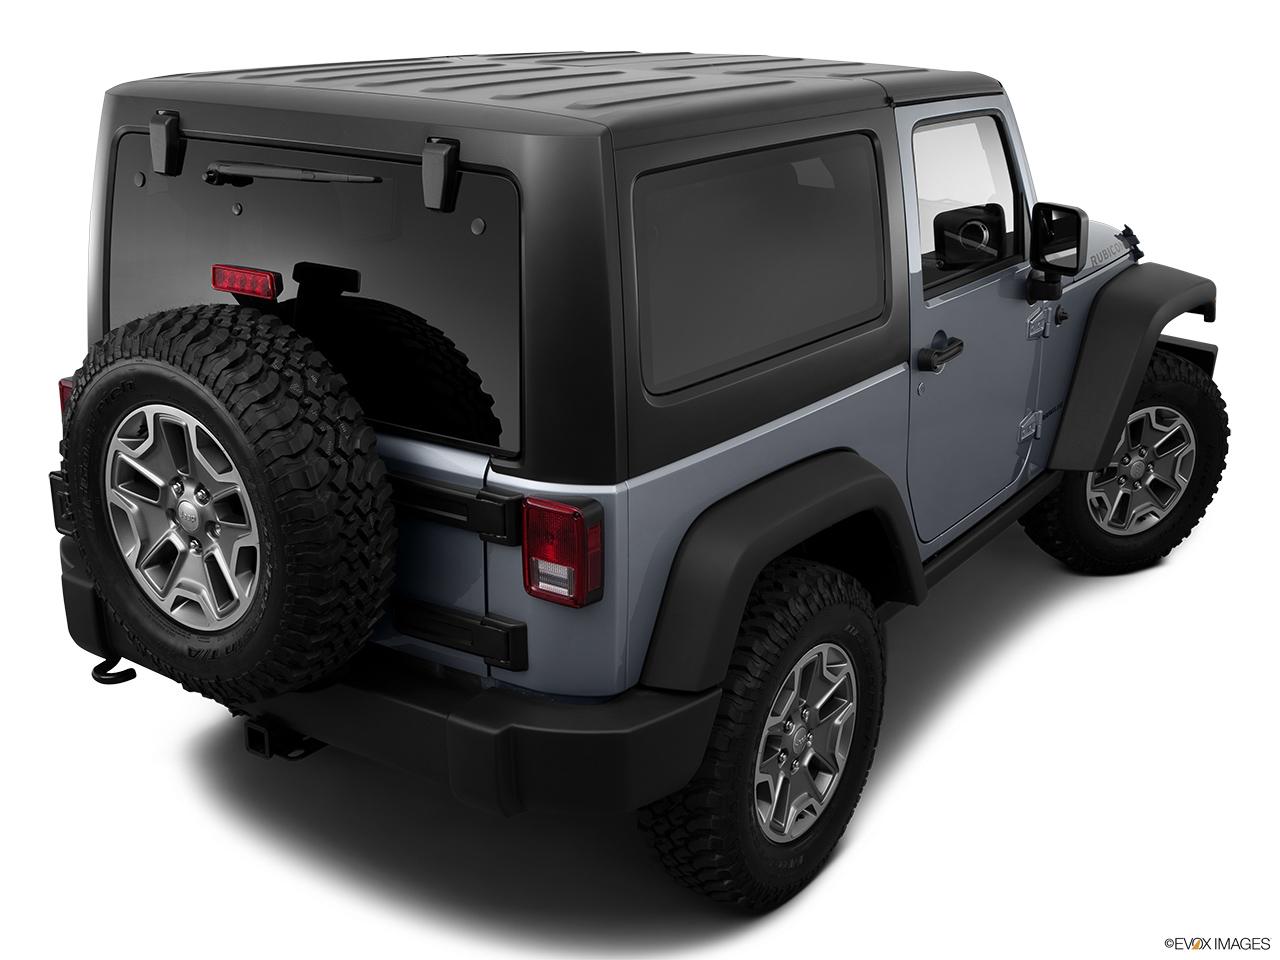 2015 jeep wrangler 4wd 2 door altitude. Black Bedroom Furniture Sets. Home Design Ideas